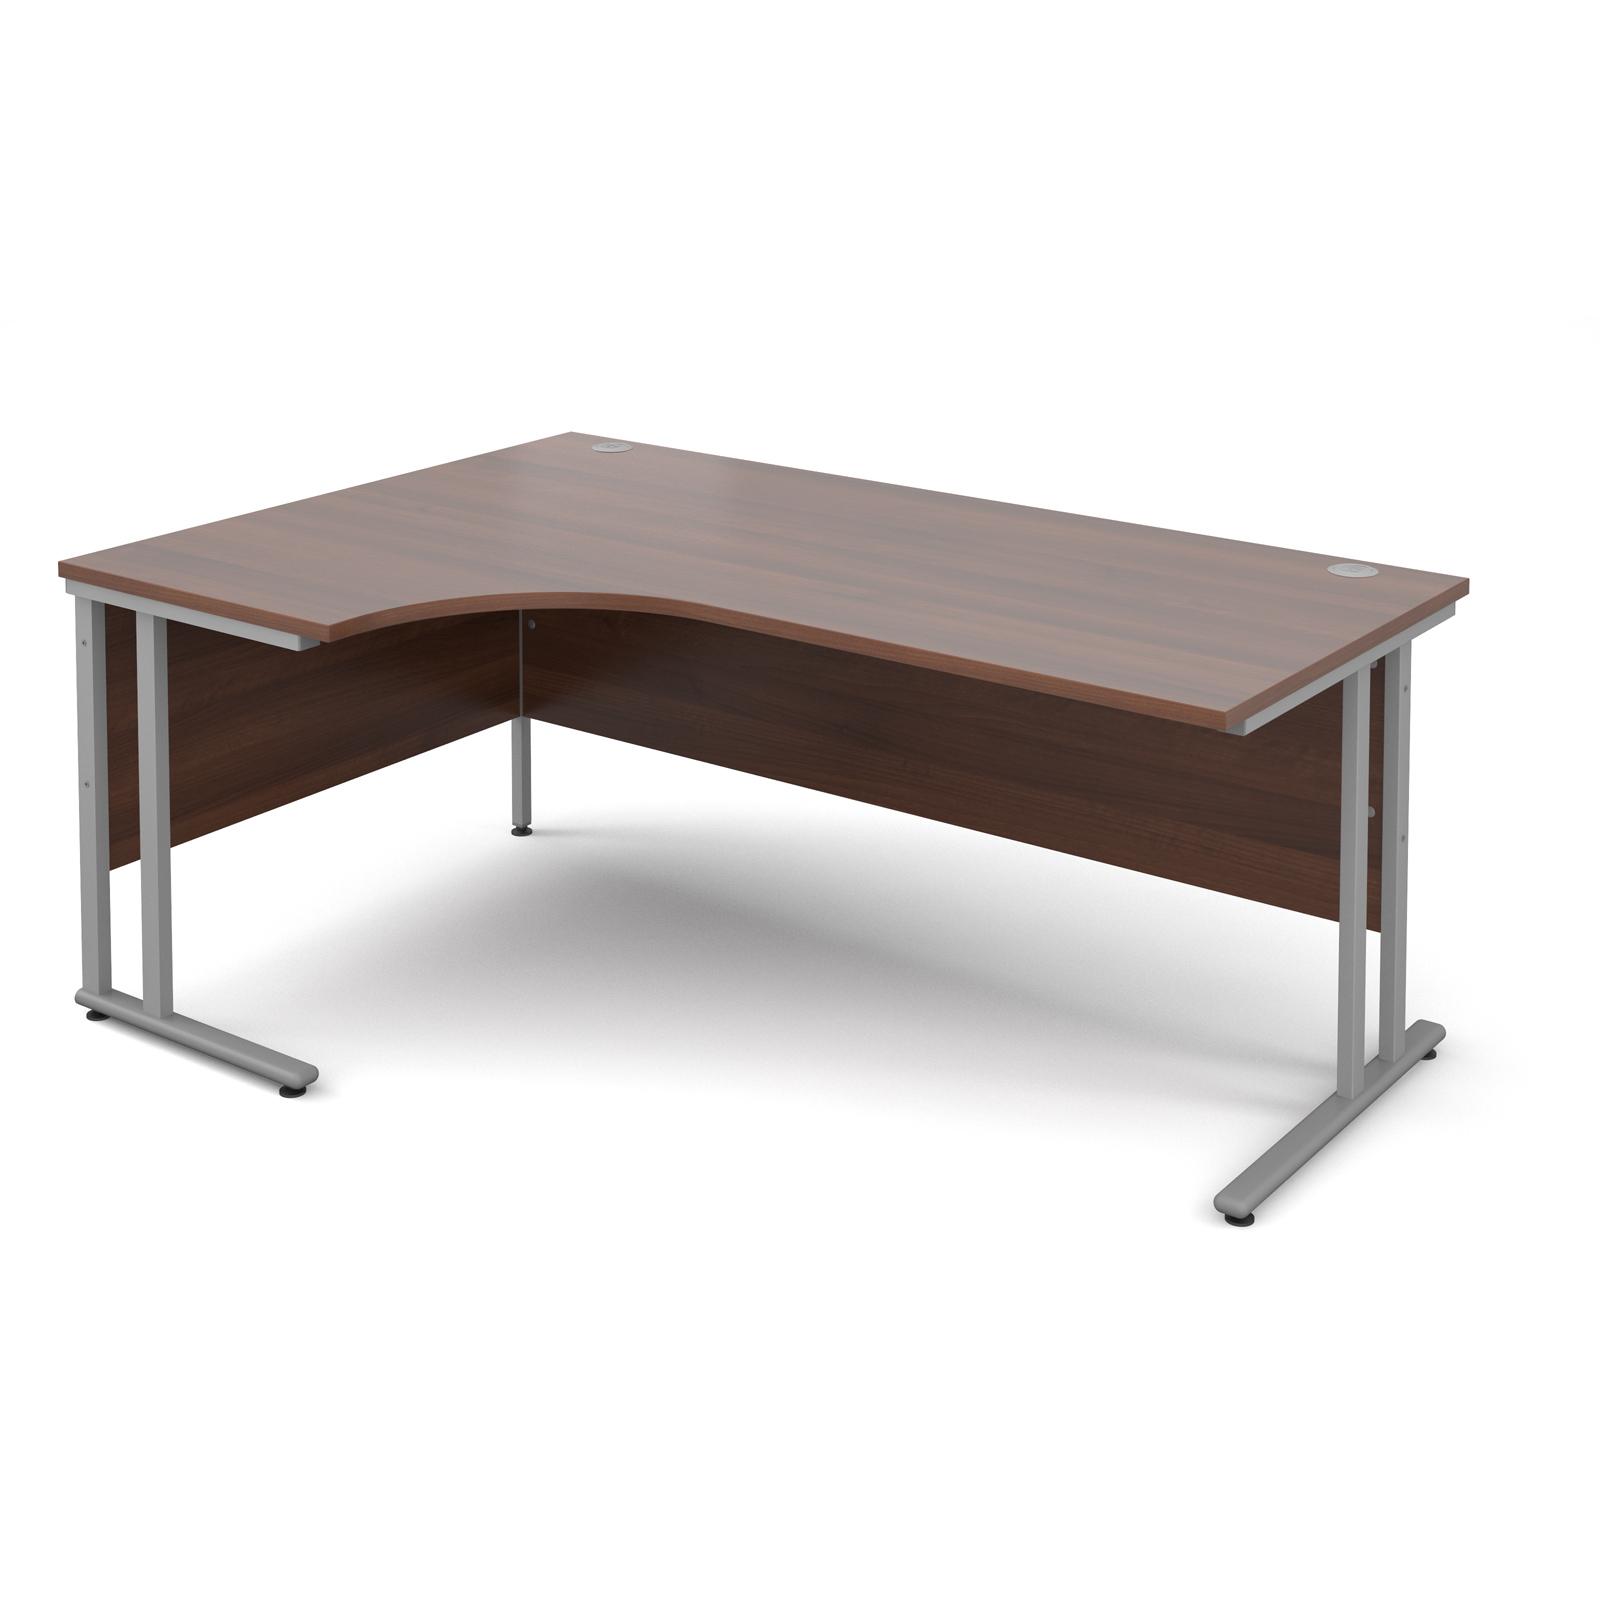 Maestro 25 SL left hand ergonomic desk 1800mm - silver cantilever frame, walnut top